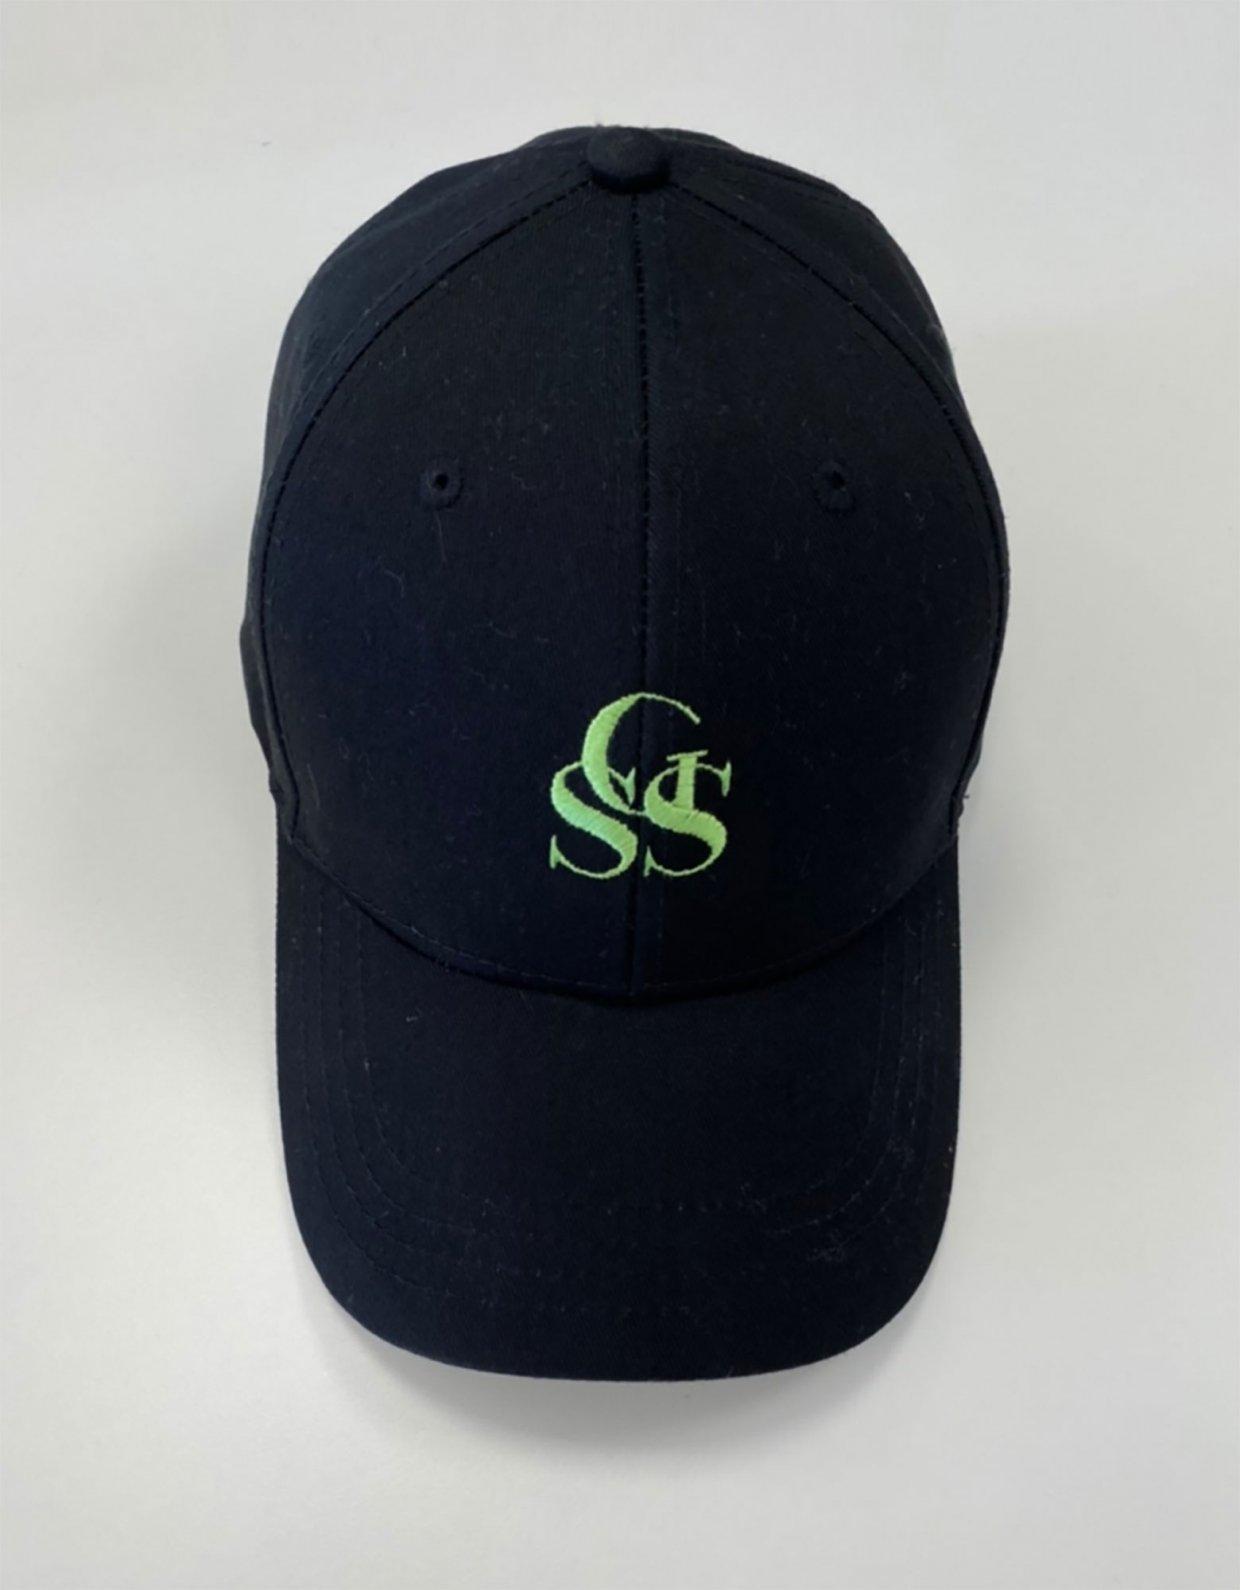 Sunset go SSG Hat black